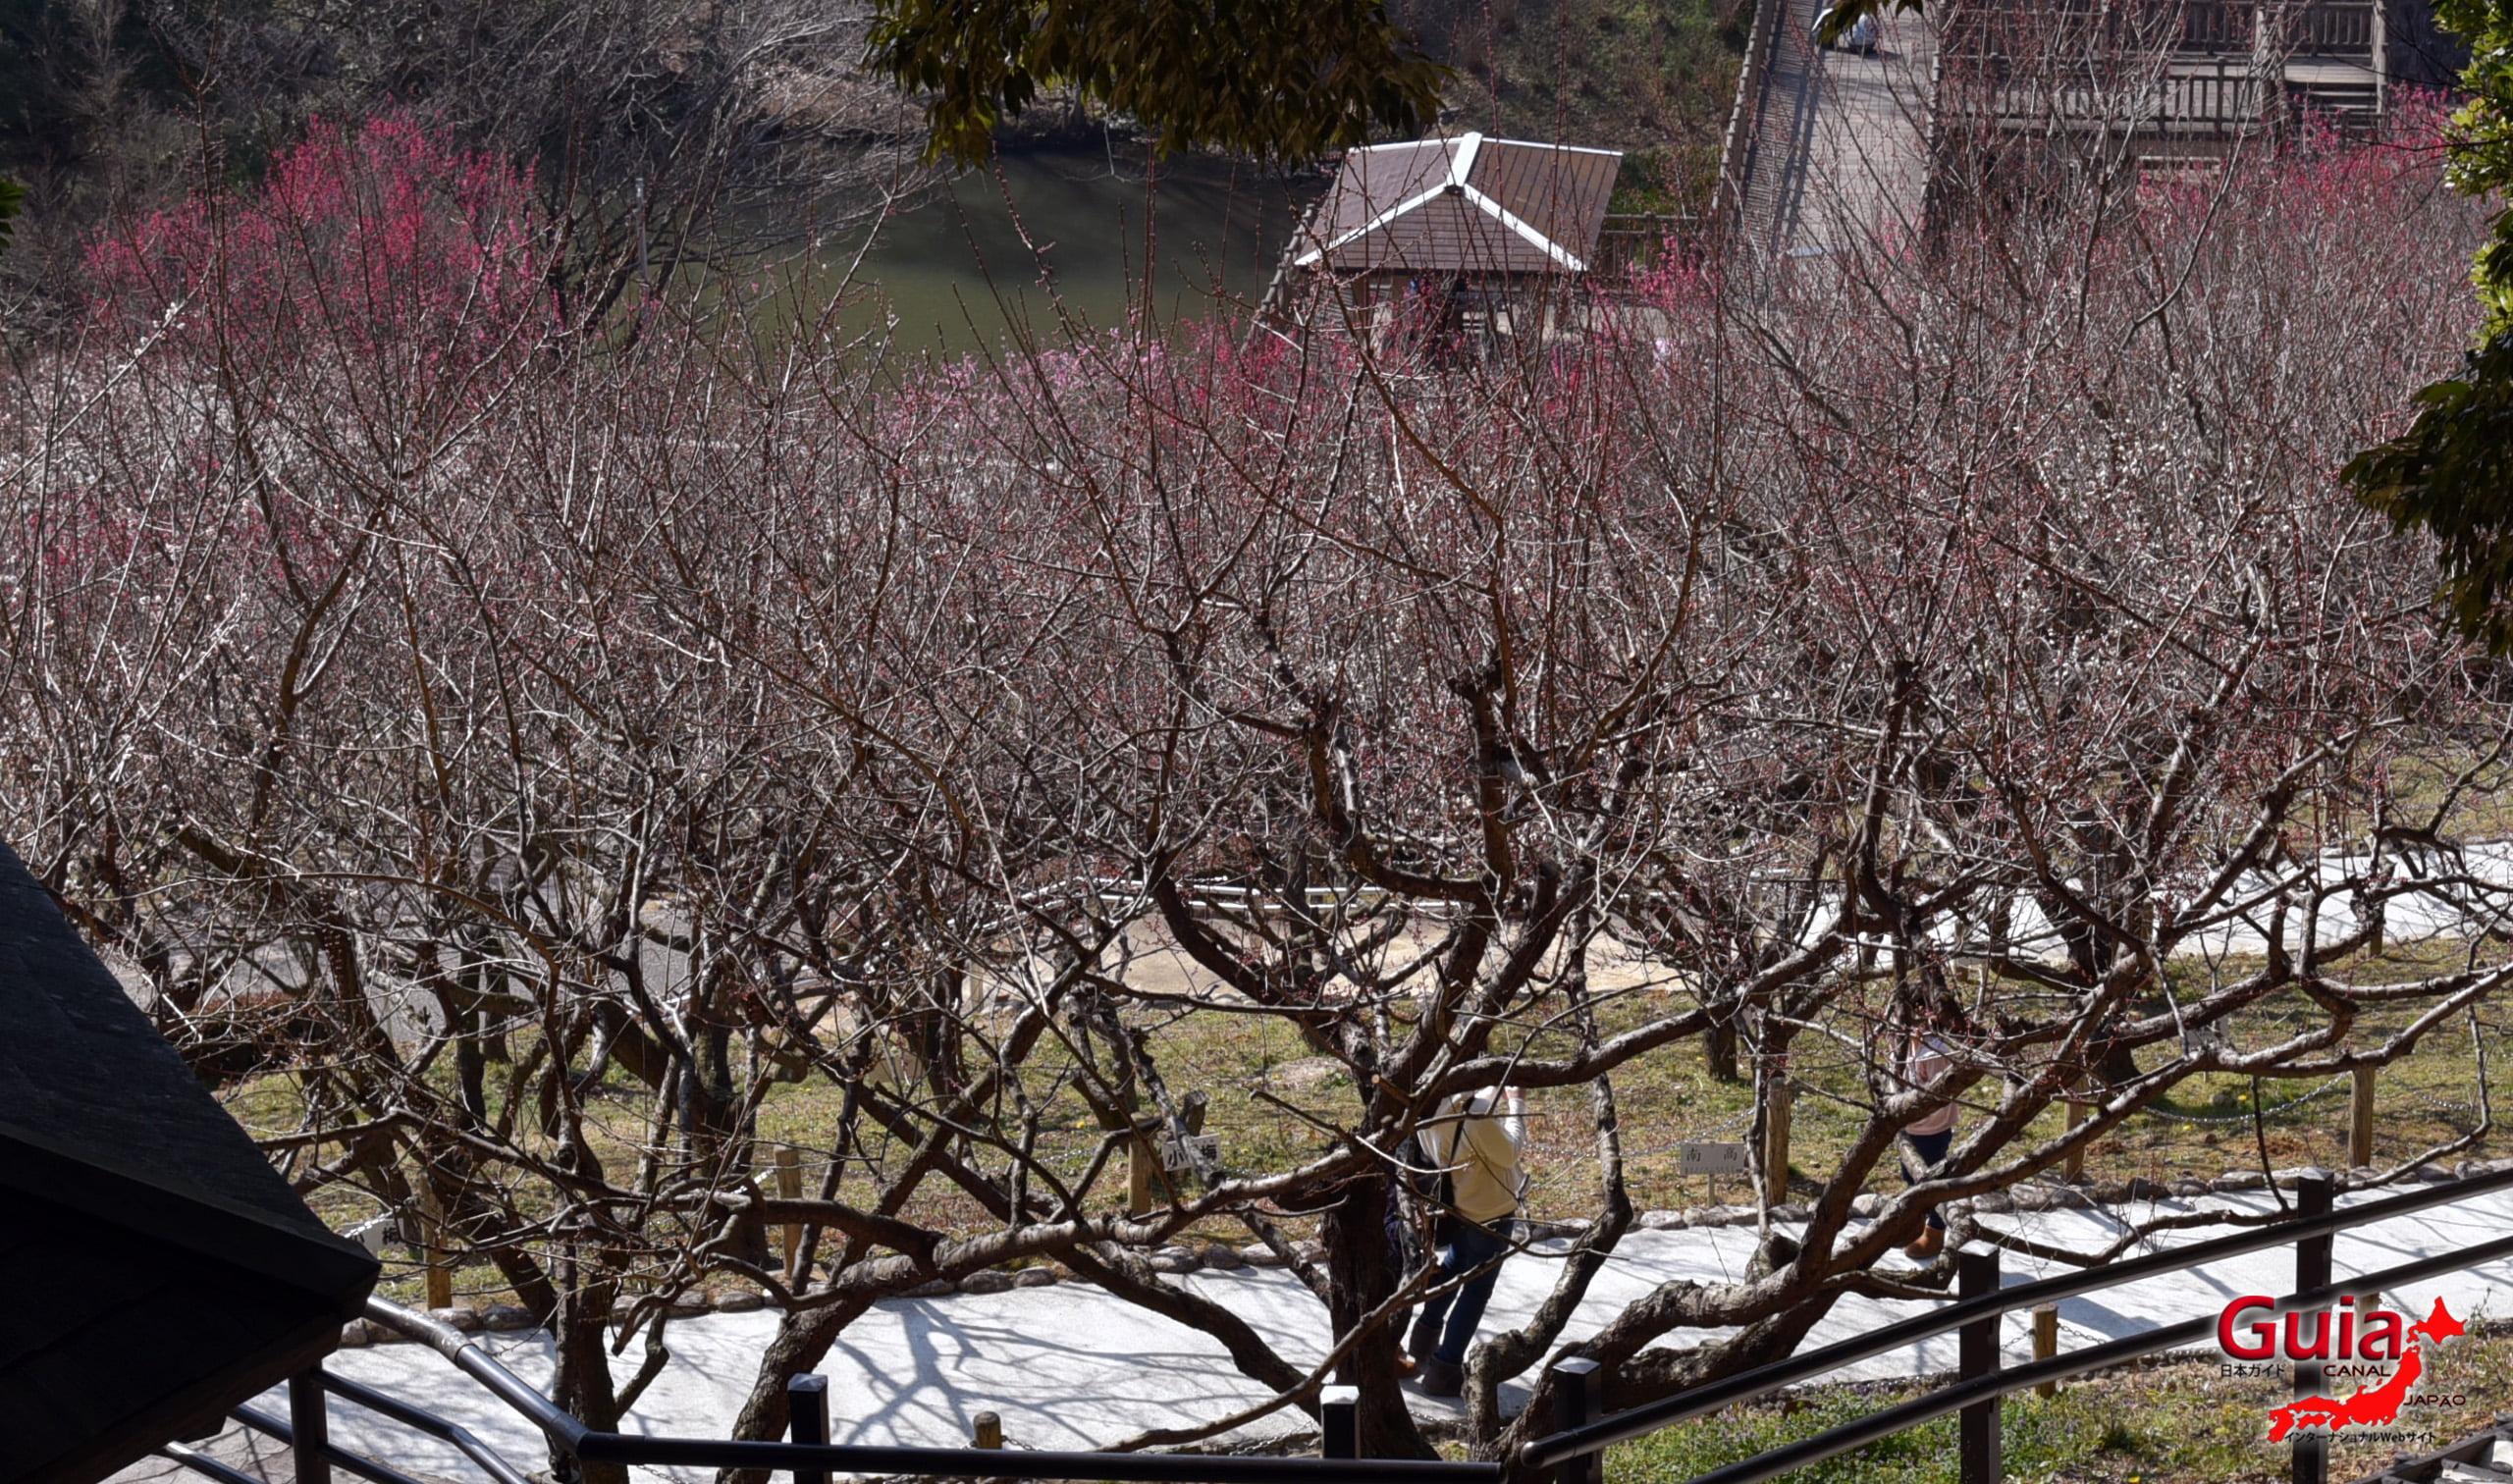 Plum Blossom Festival (Ume) - Akatsukayama Toyokawa Park 16